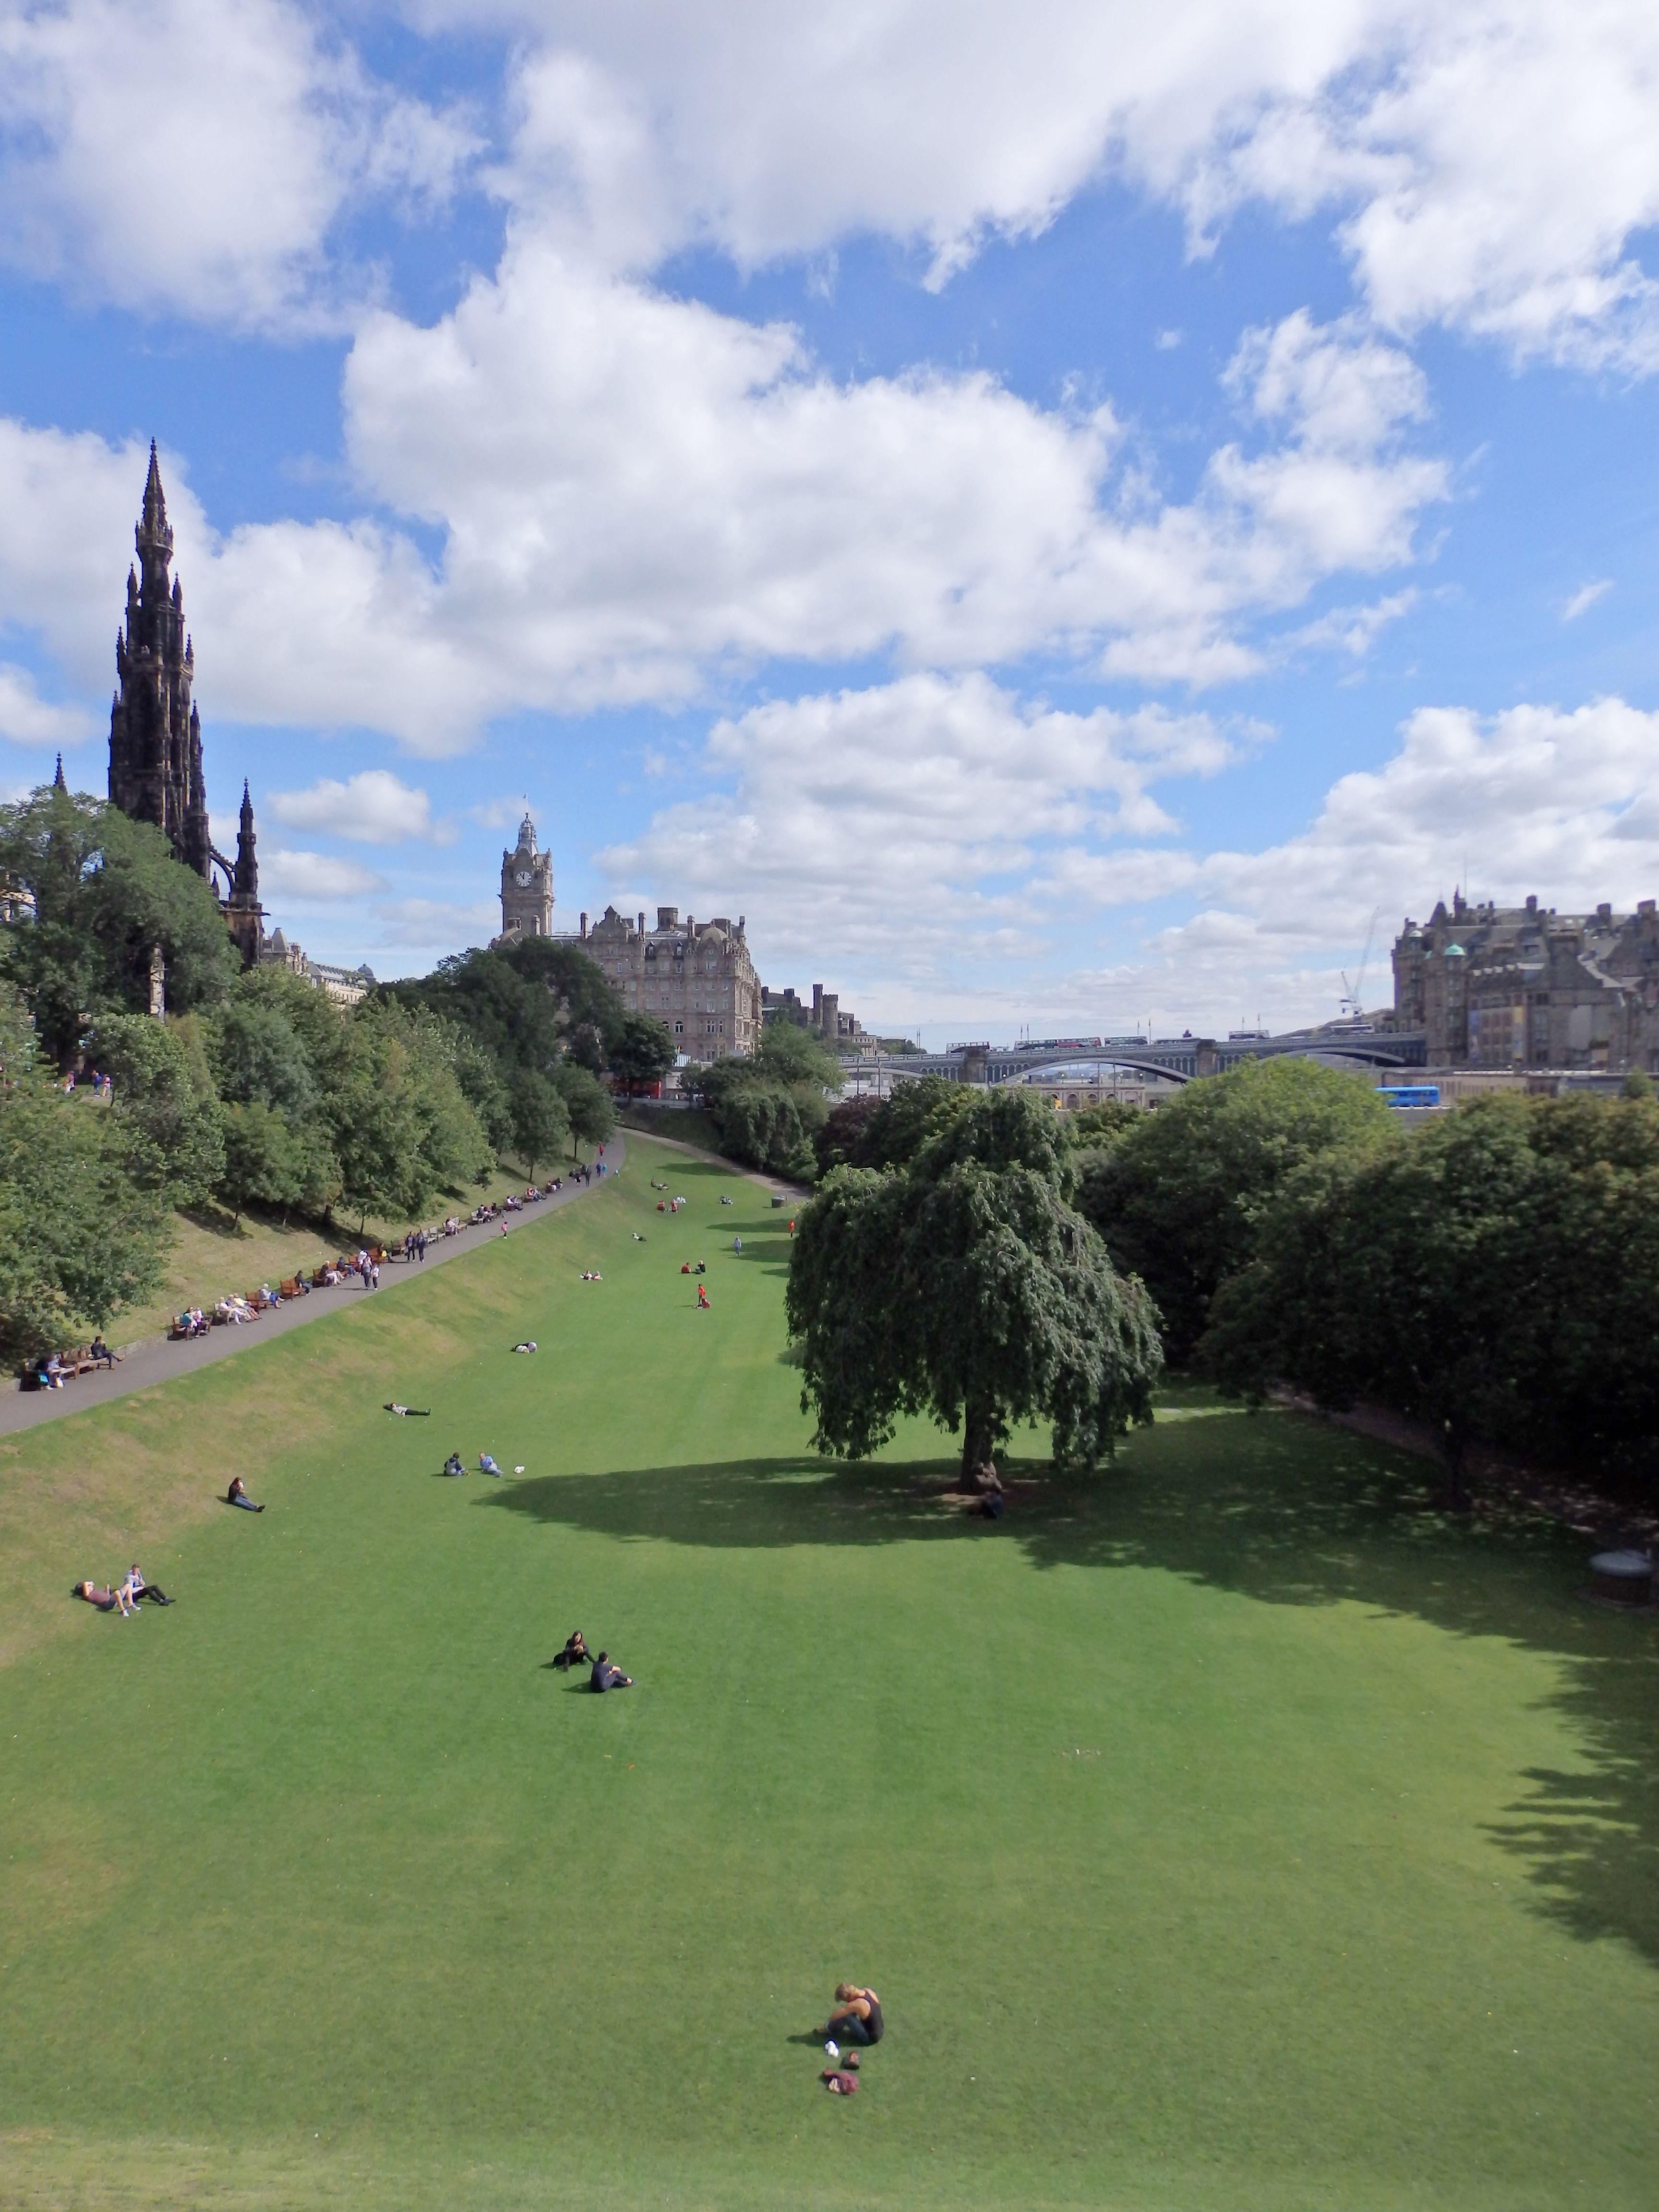 Princes Street Gardens, Edinburgh.  https://analogueboyinadigitalworld.wordpress.com/2015/09/02/edinblog-2015/